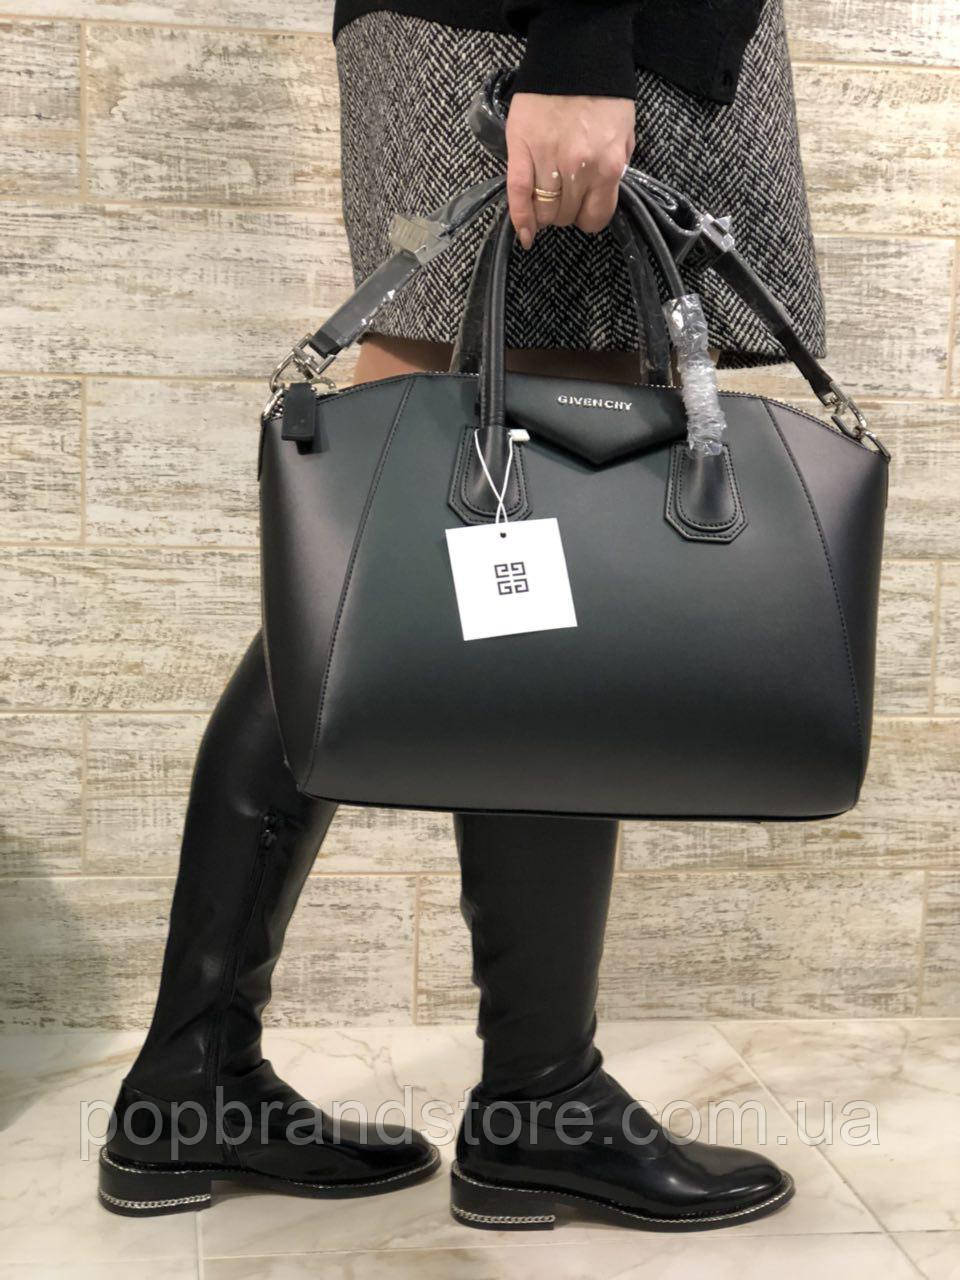 bcb9792f0d1a Сумка GIVENCHY ANTIGONA гладкая кожа (реплика) - Pop Brand Store | брендовые  сумки,